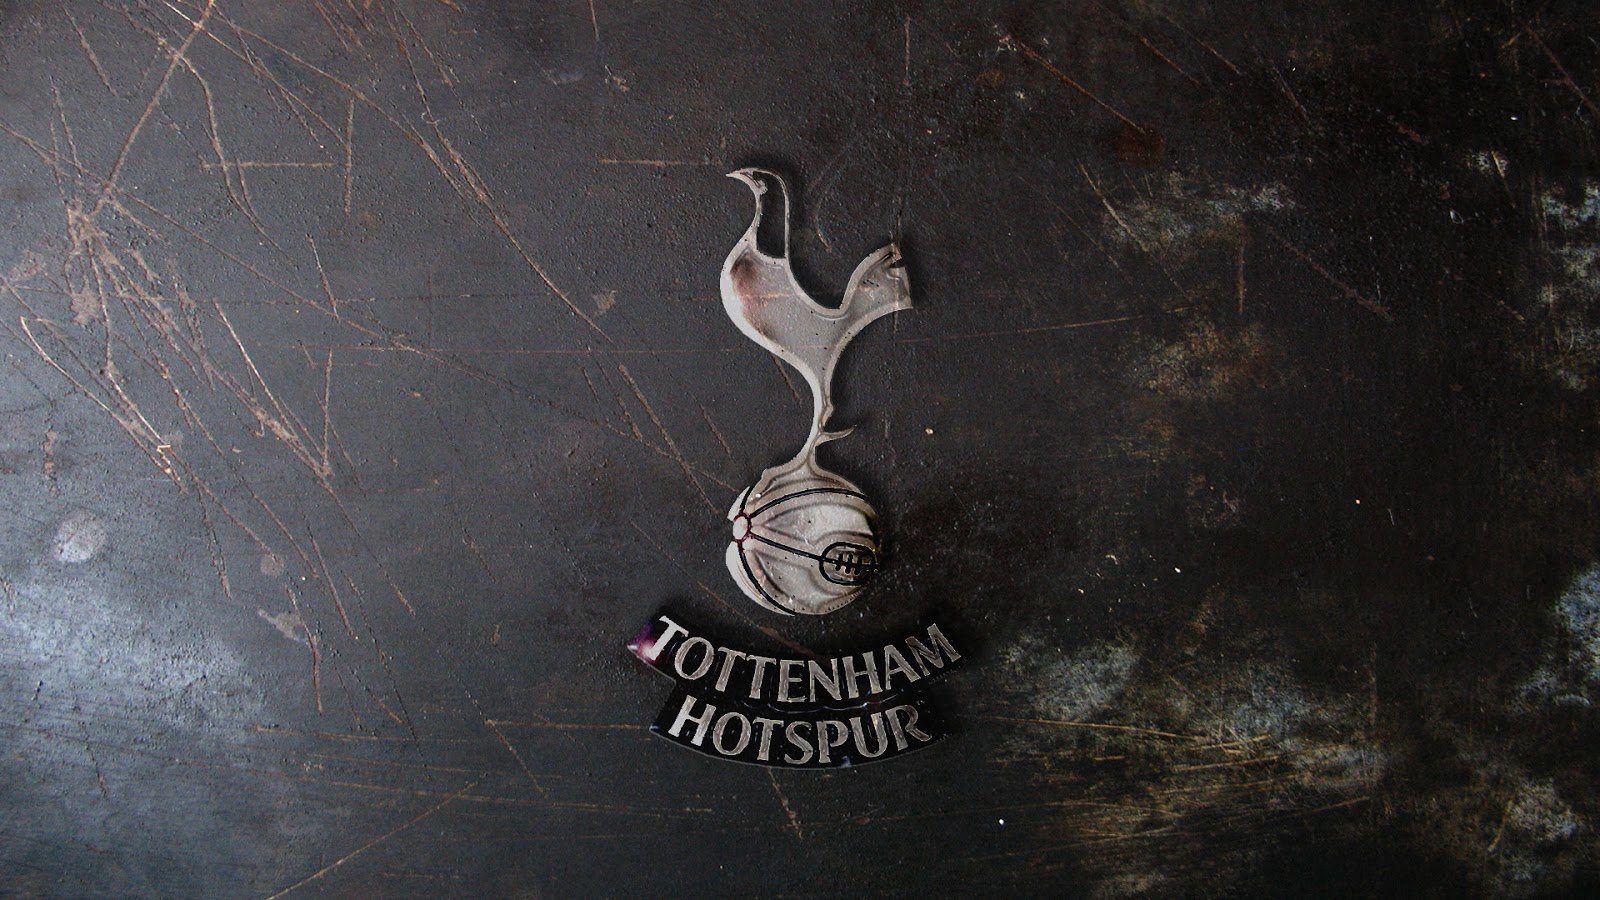 timeless design a620f 83db7 Tottenham Hotspur 2019/2020 Kit - Dream League Soccer Kits